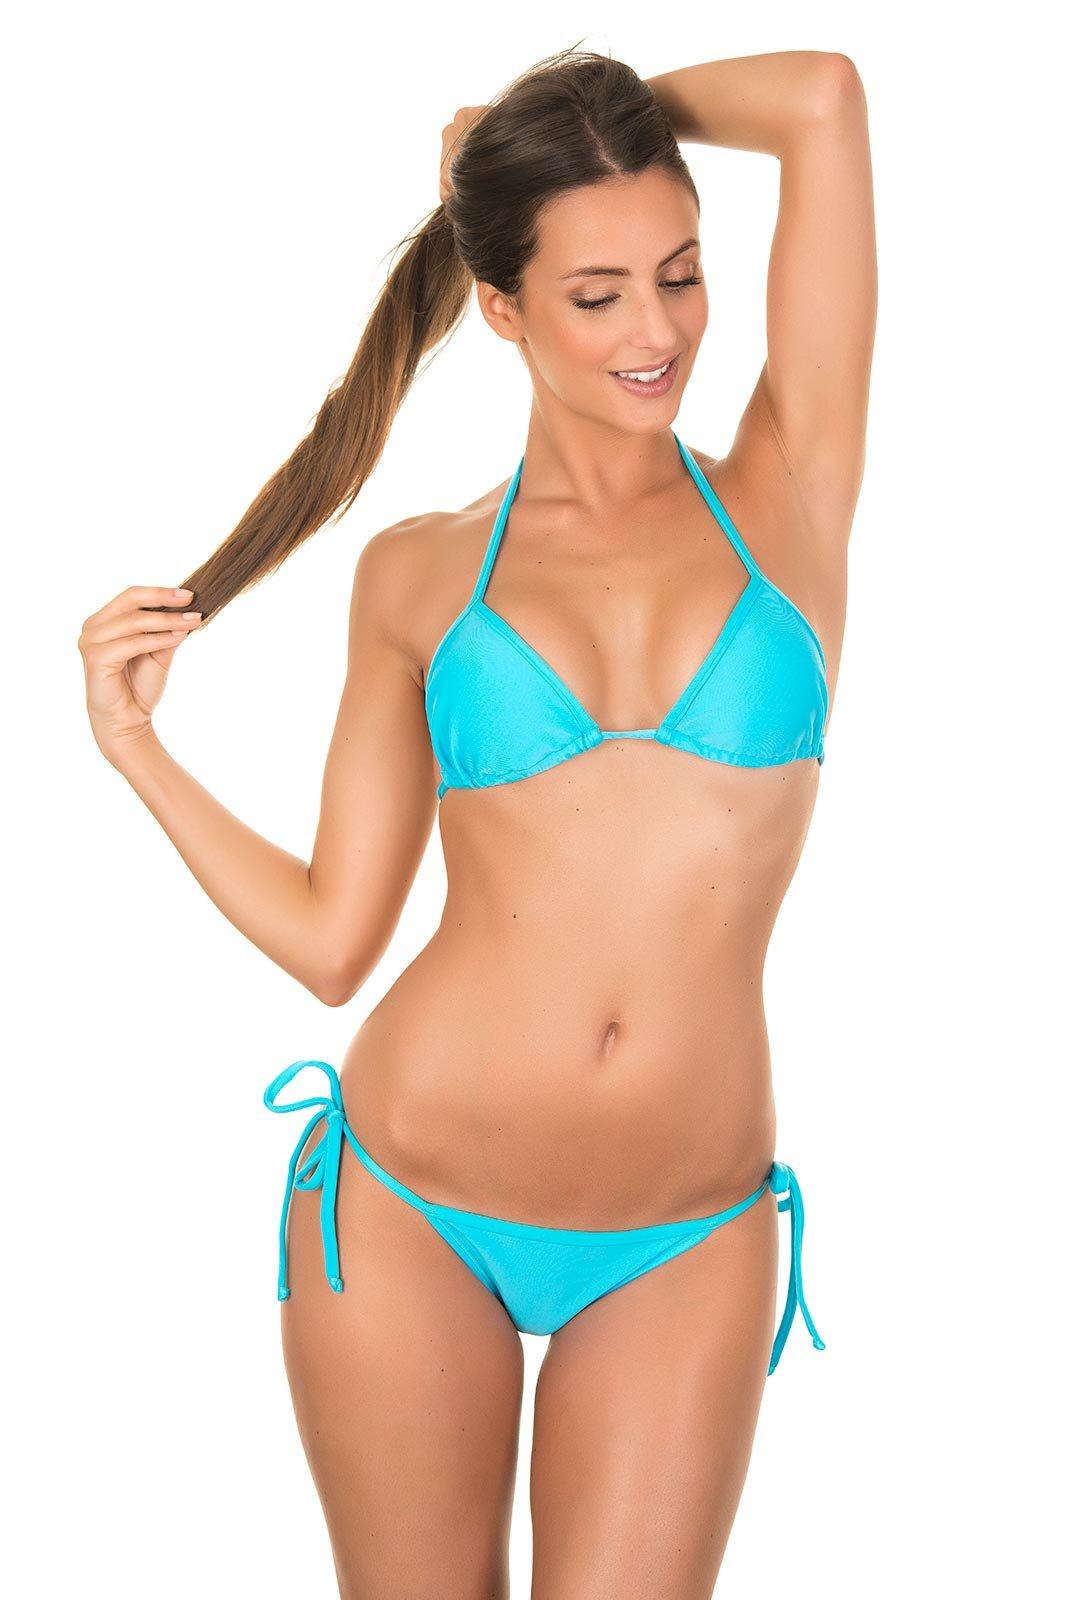 Brazilian bikini photos